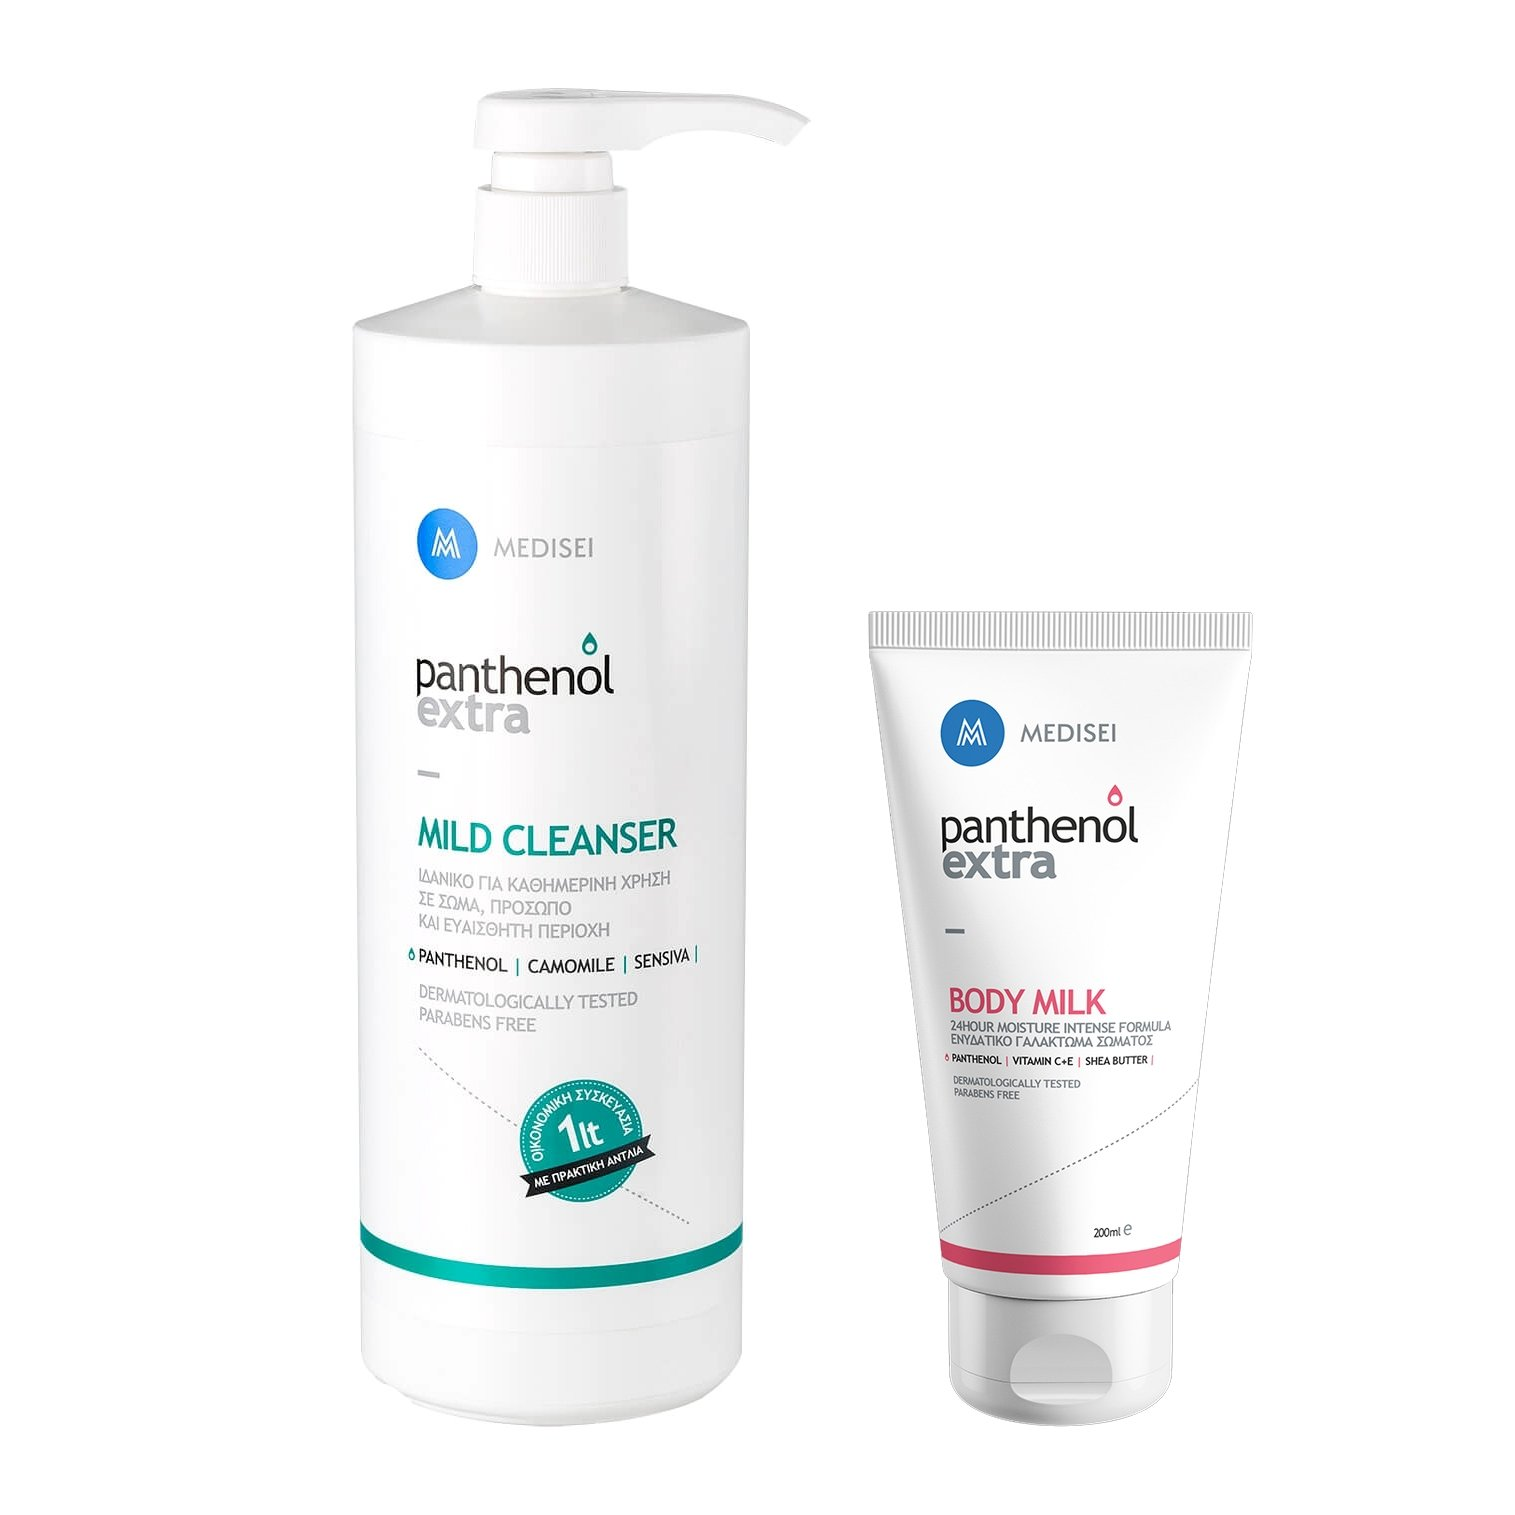 Medisei Panthenol Extra Promo Mild Cleanser 1L & Δώρο Body Milk 200ml